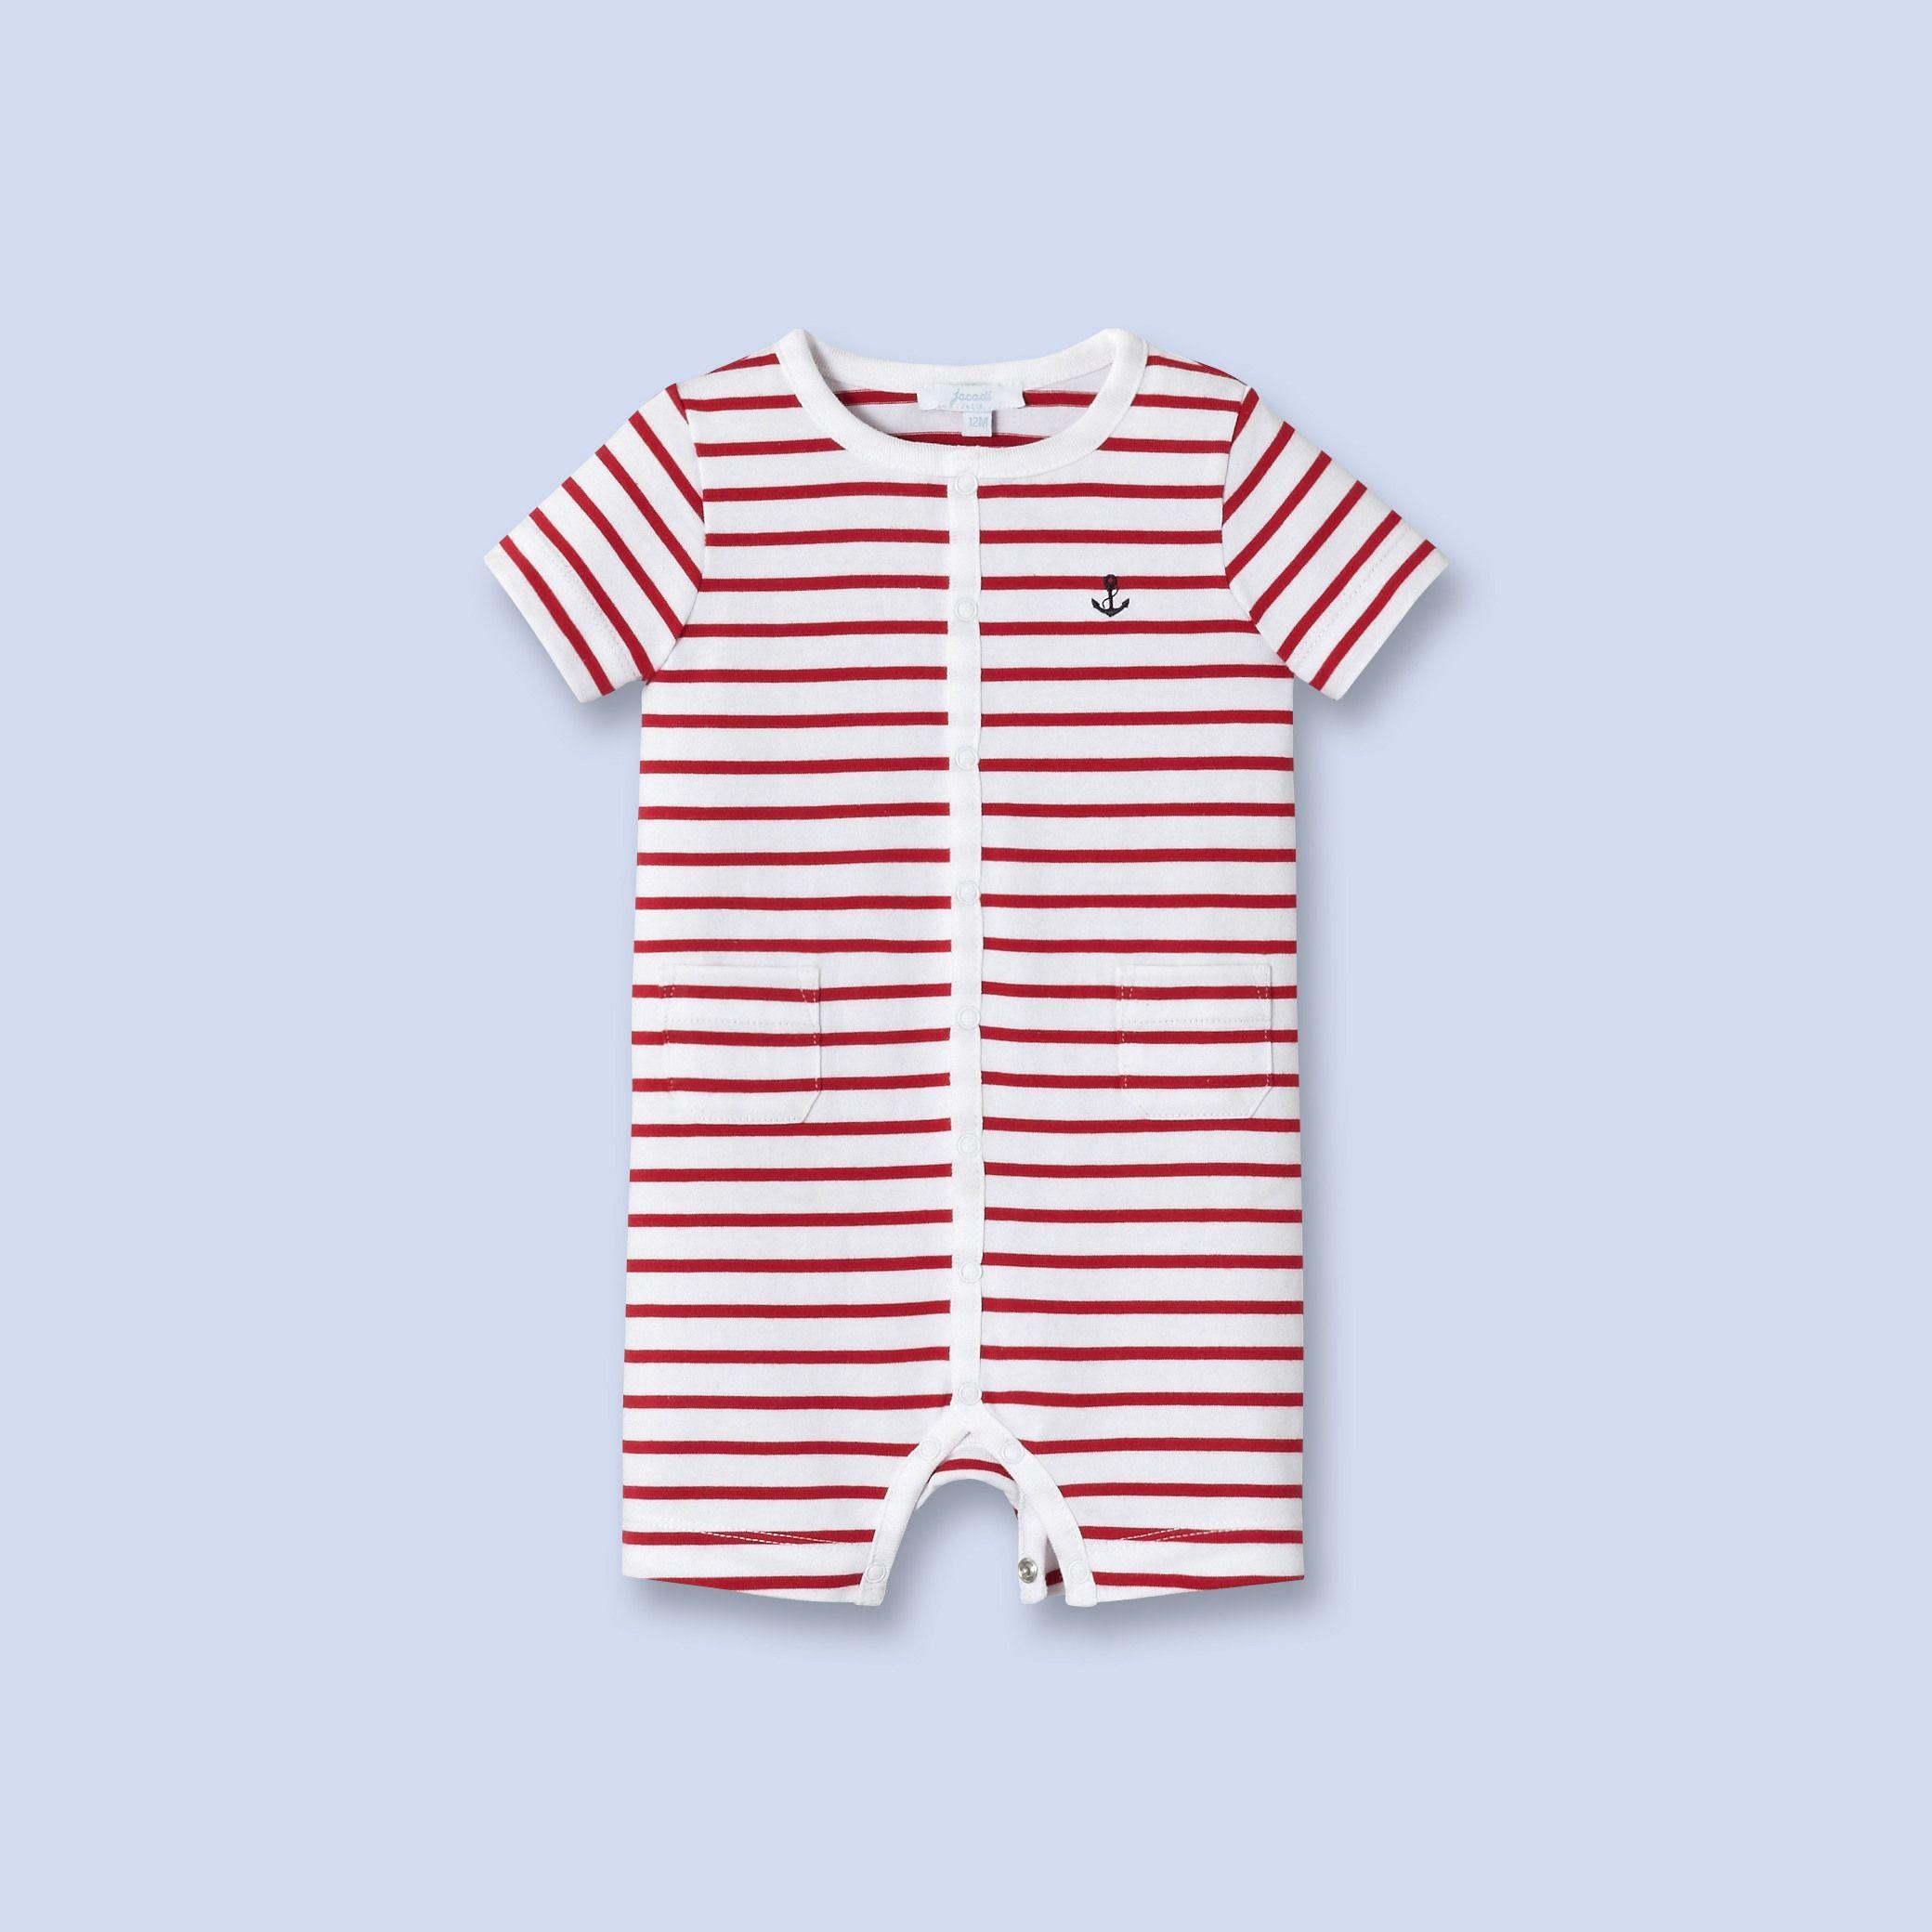 c94afd99d Striped cotton romper - Boy - WHITE RED - Jacadi Paris